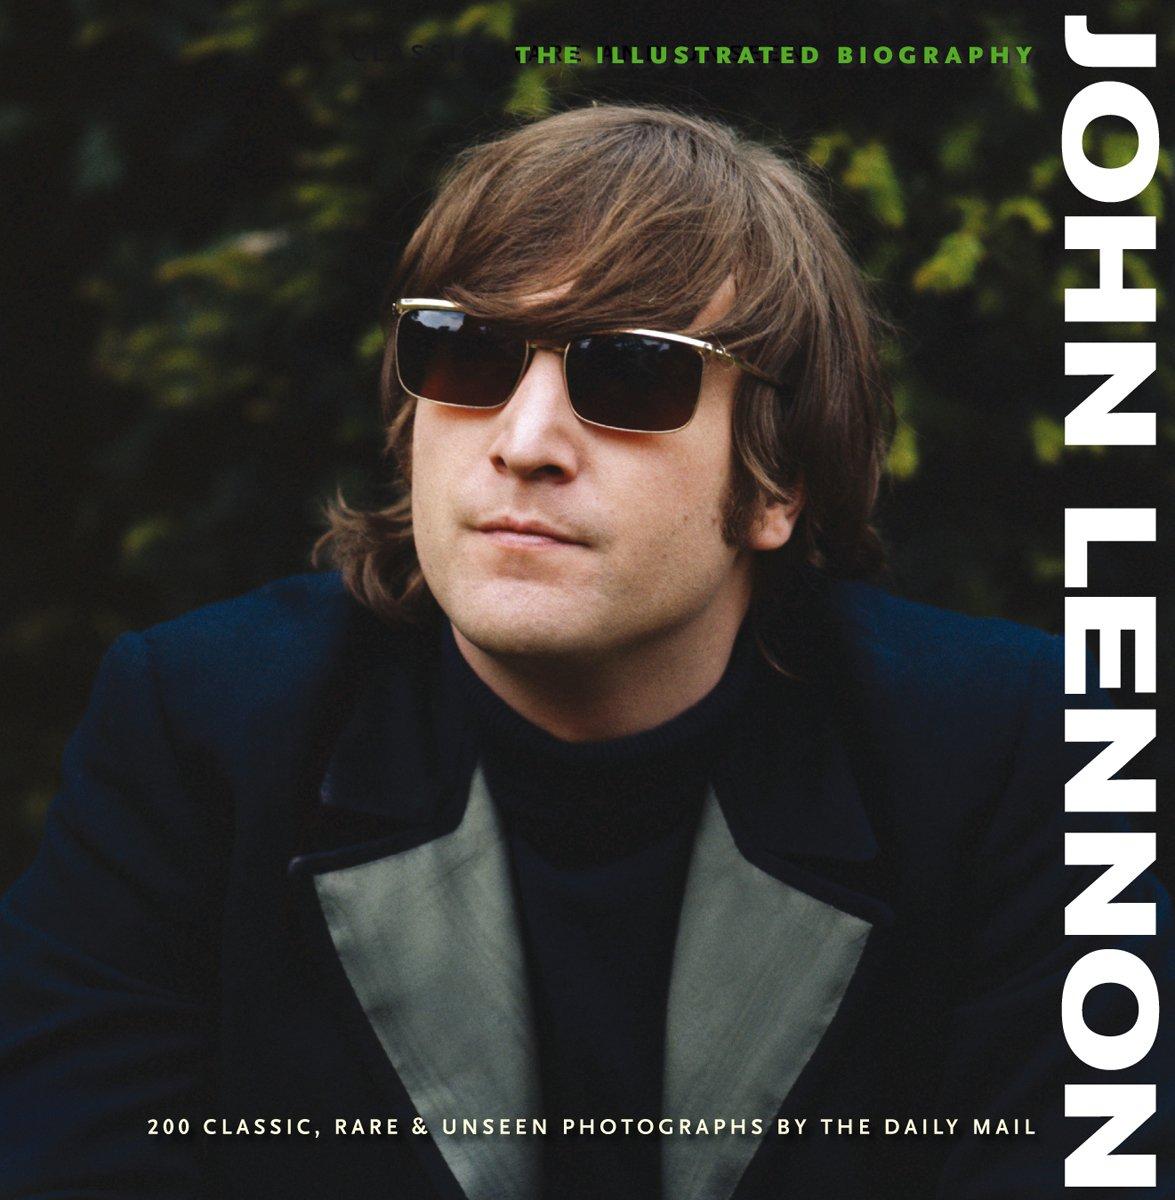 John Lennon: The Illustrated Biography